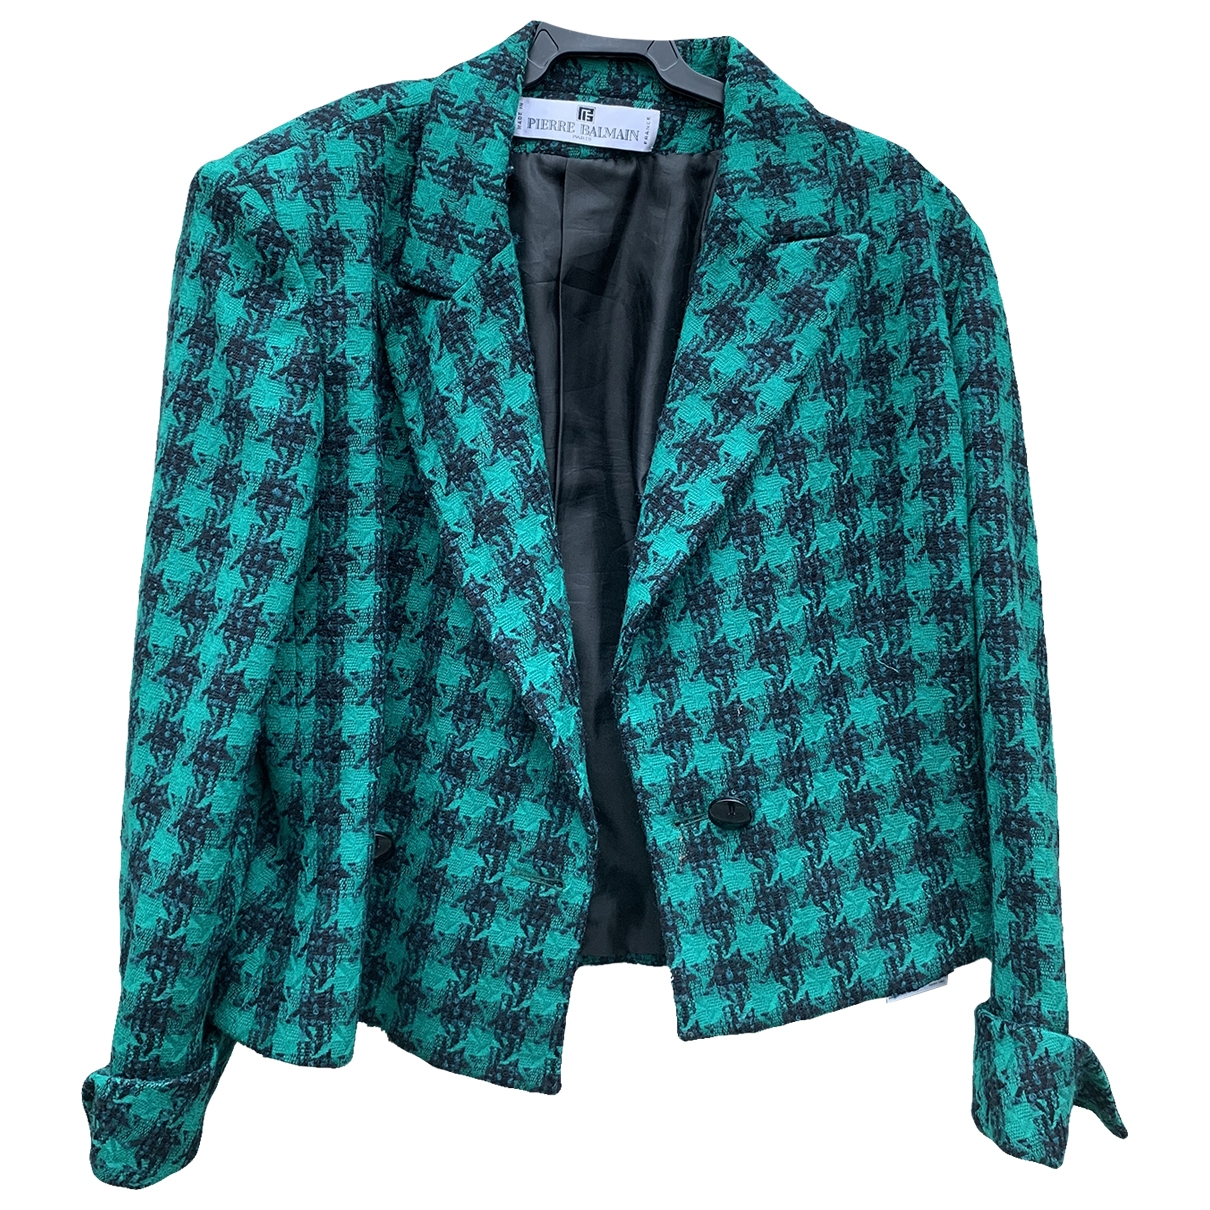 Pierre Balmain \N Turquoise Wool jacket for Women 42 FR